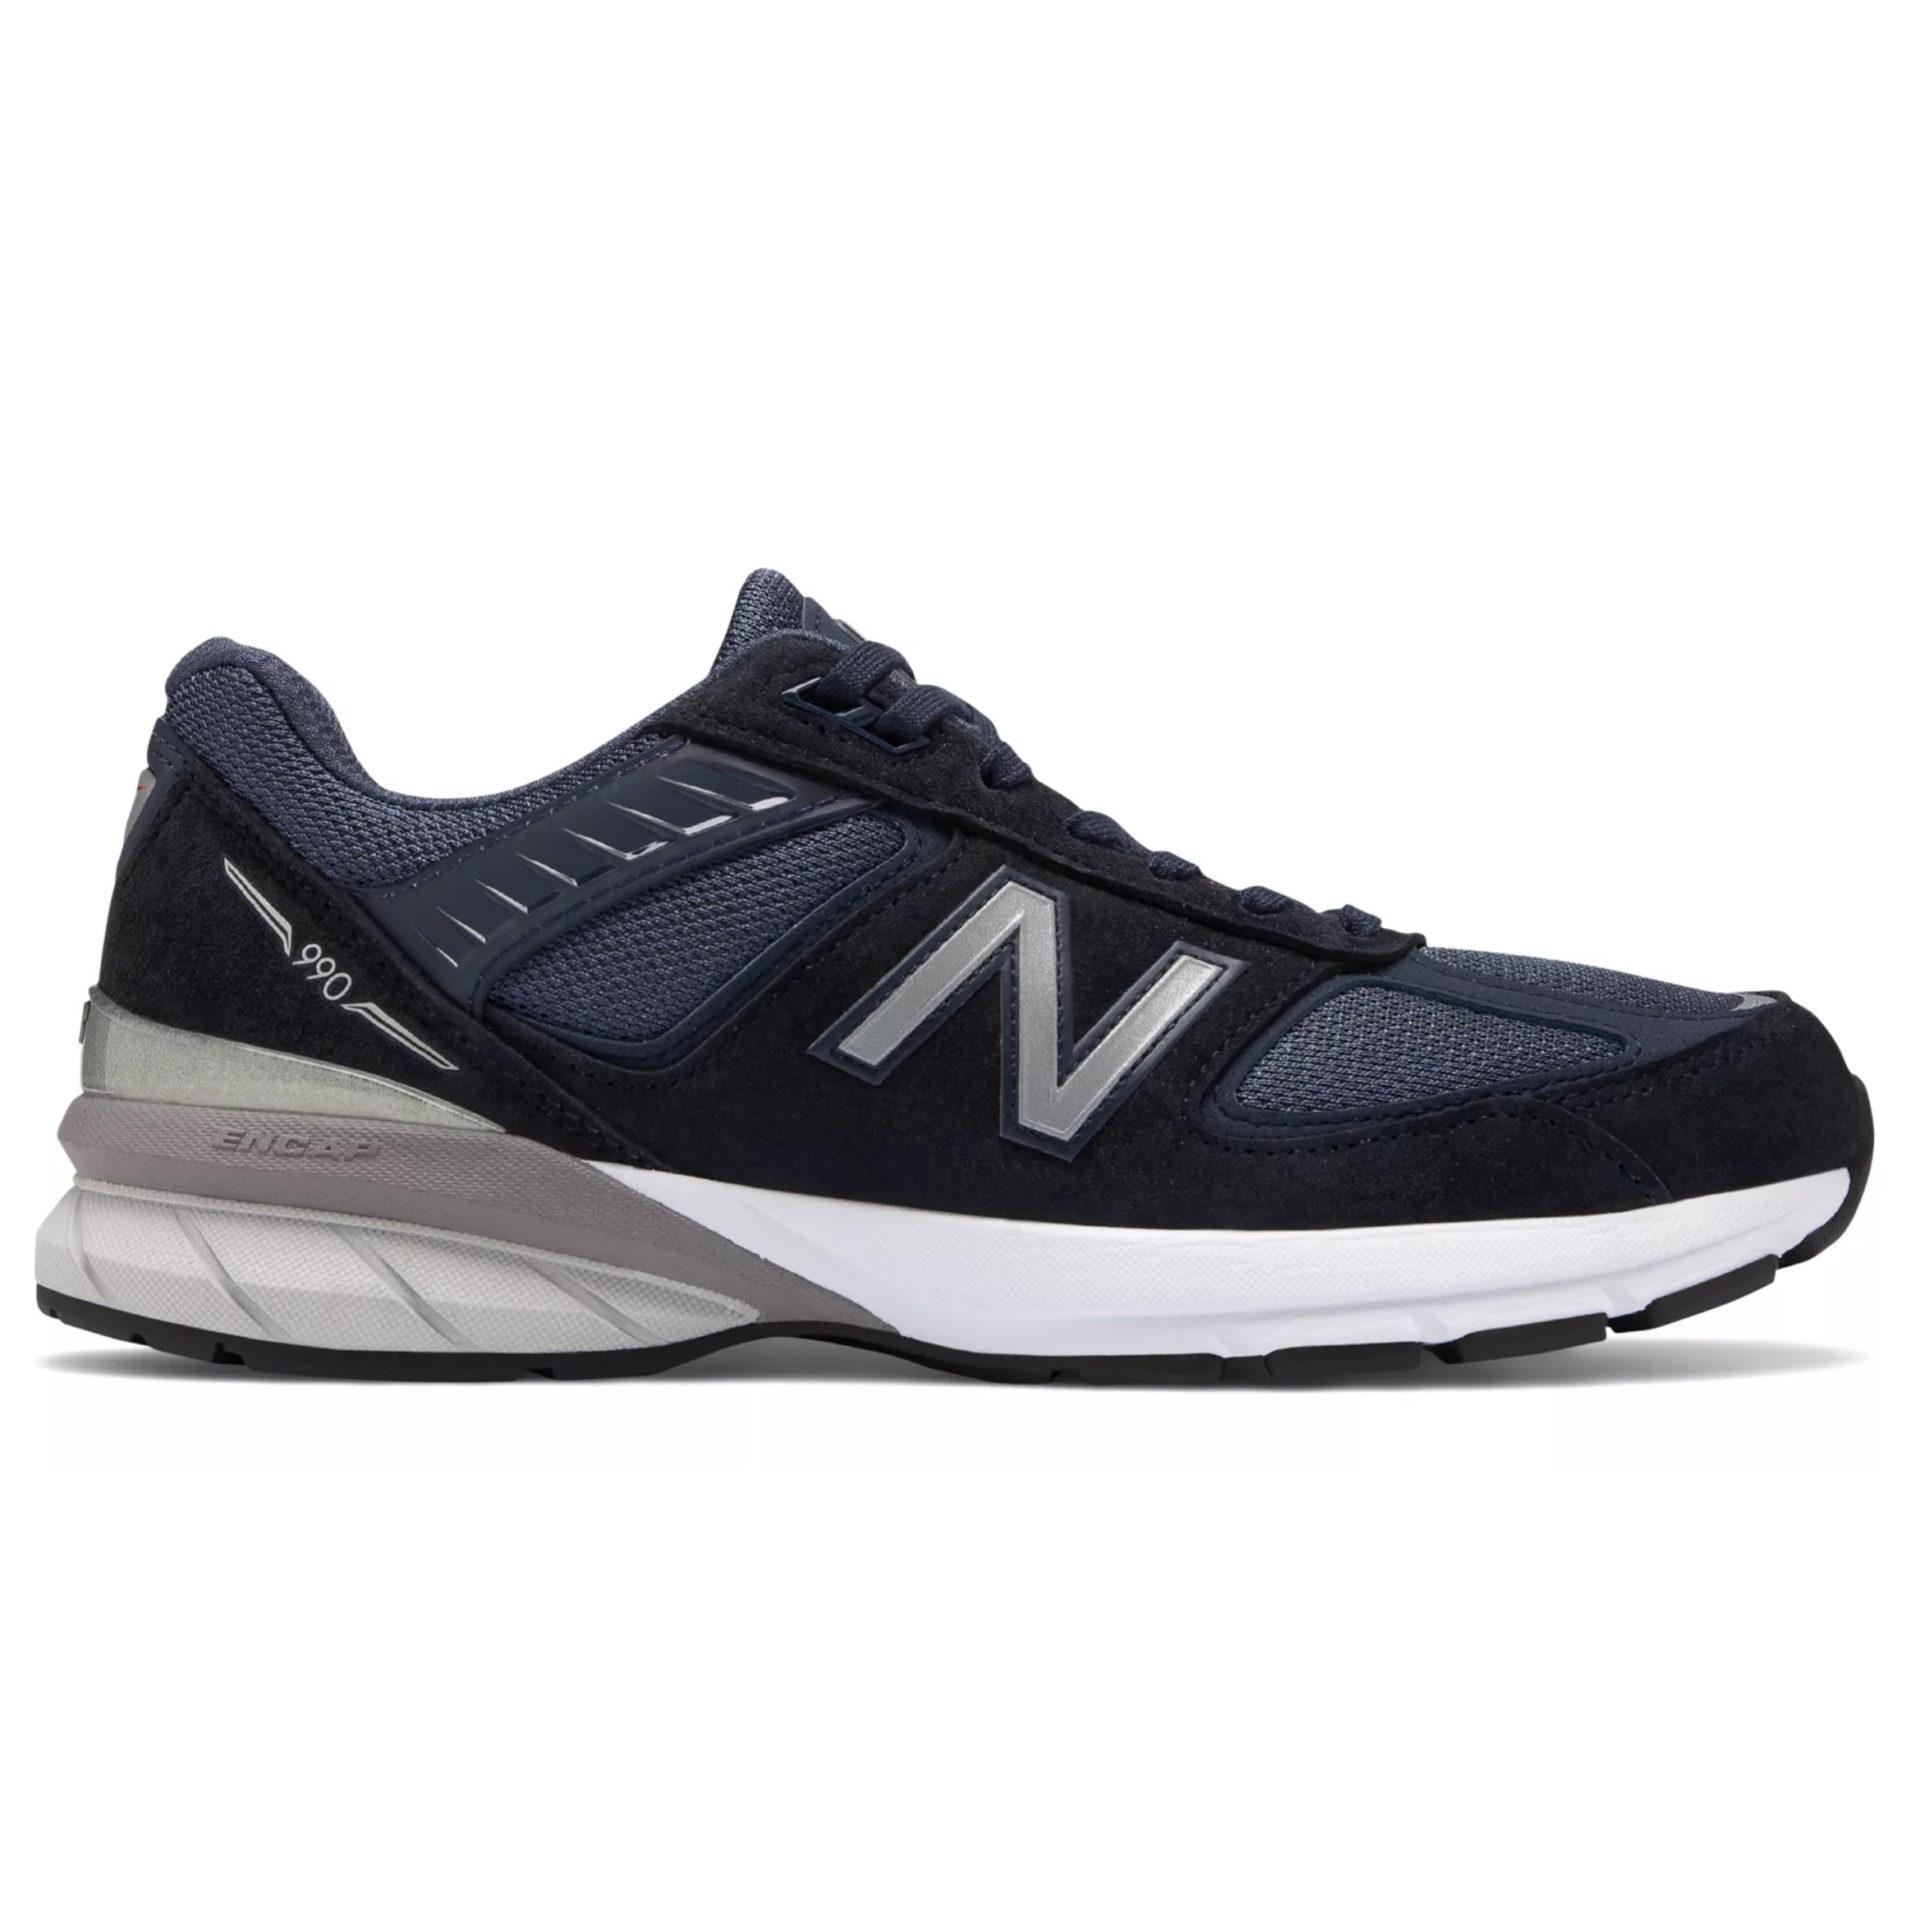 Keen Shoes Mens 13